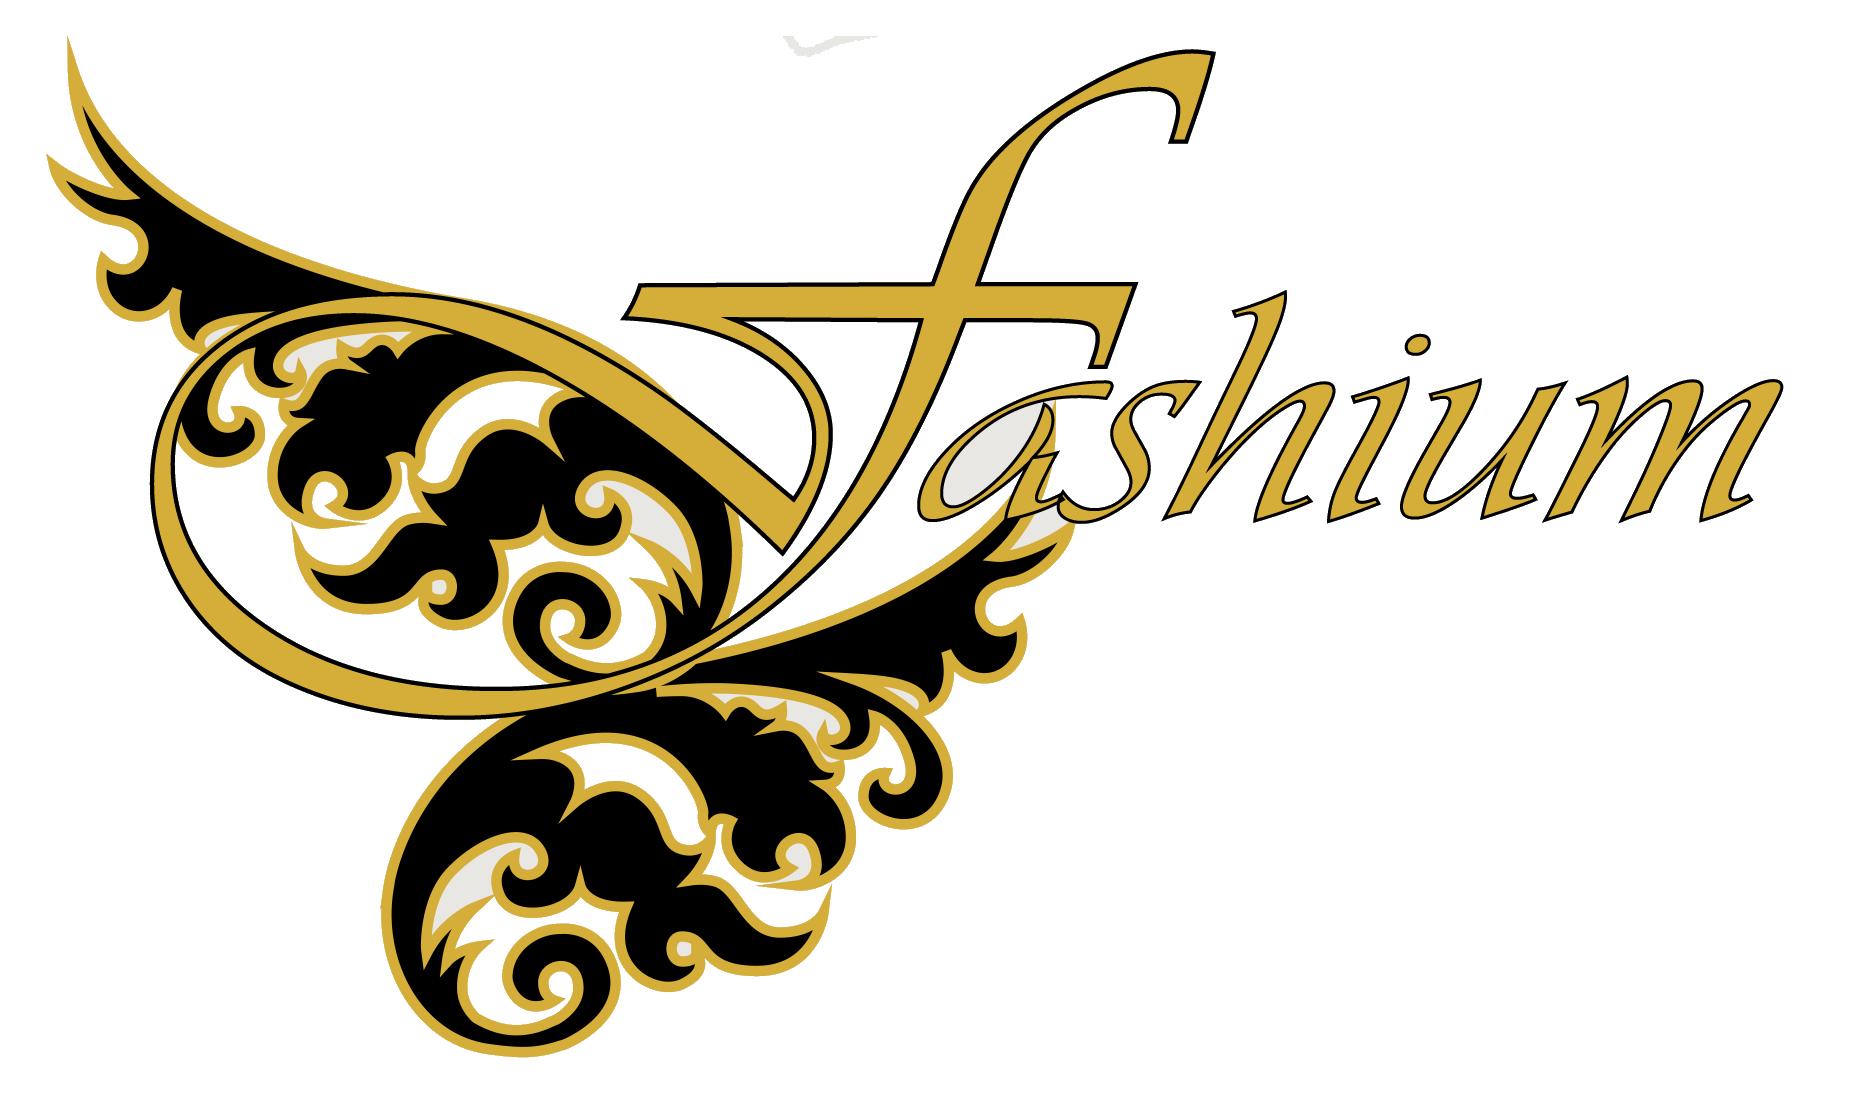 fashium logo asesoría de imagen - Personal Shopper - Maquillaje - Automaquillaje